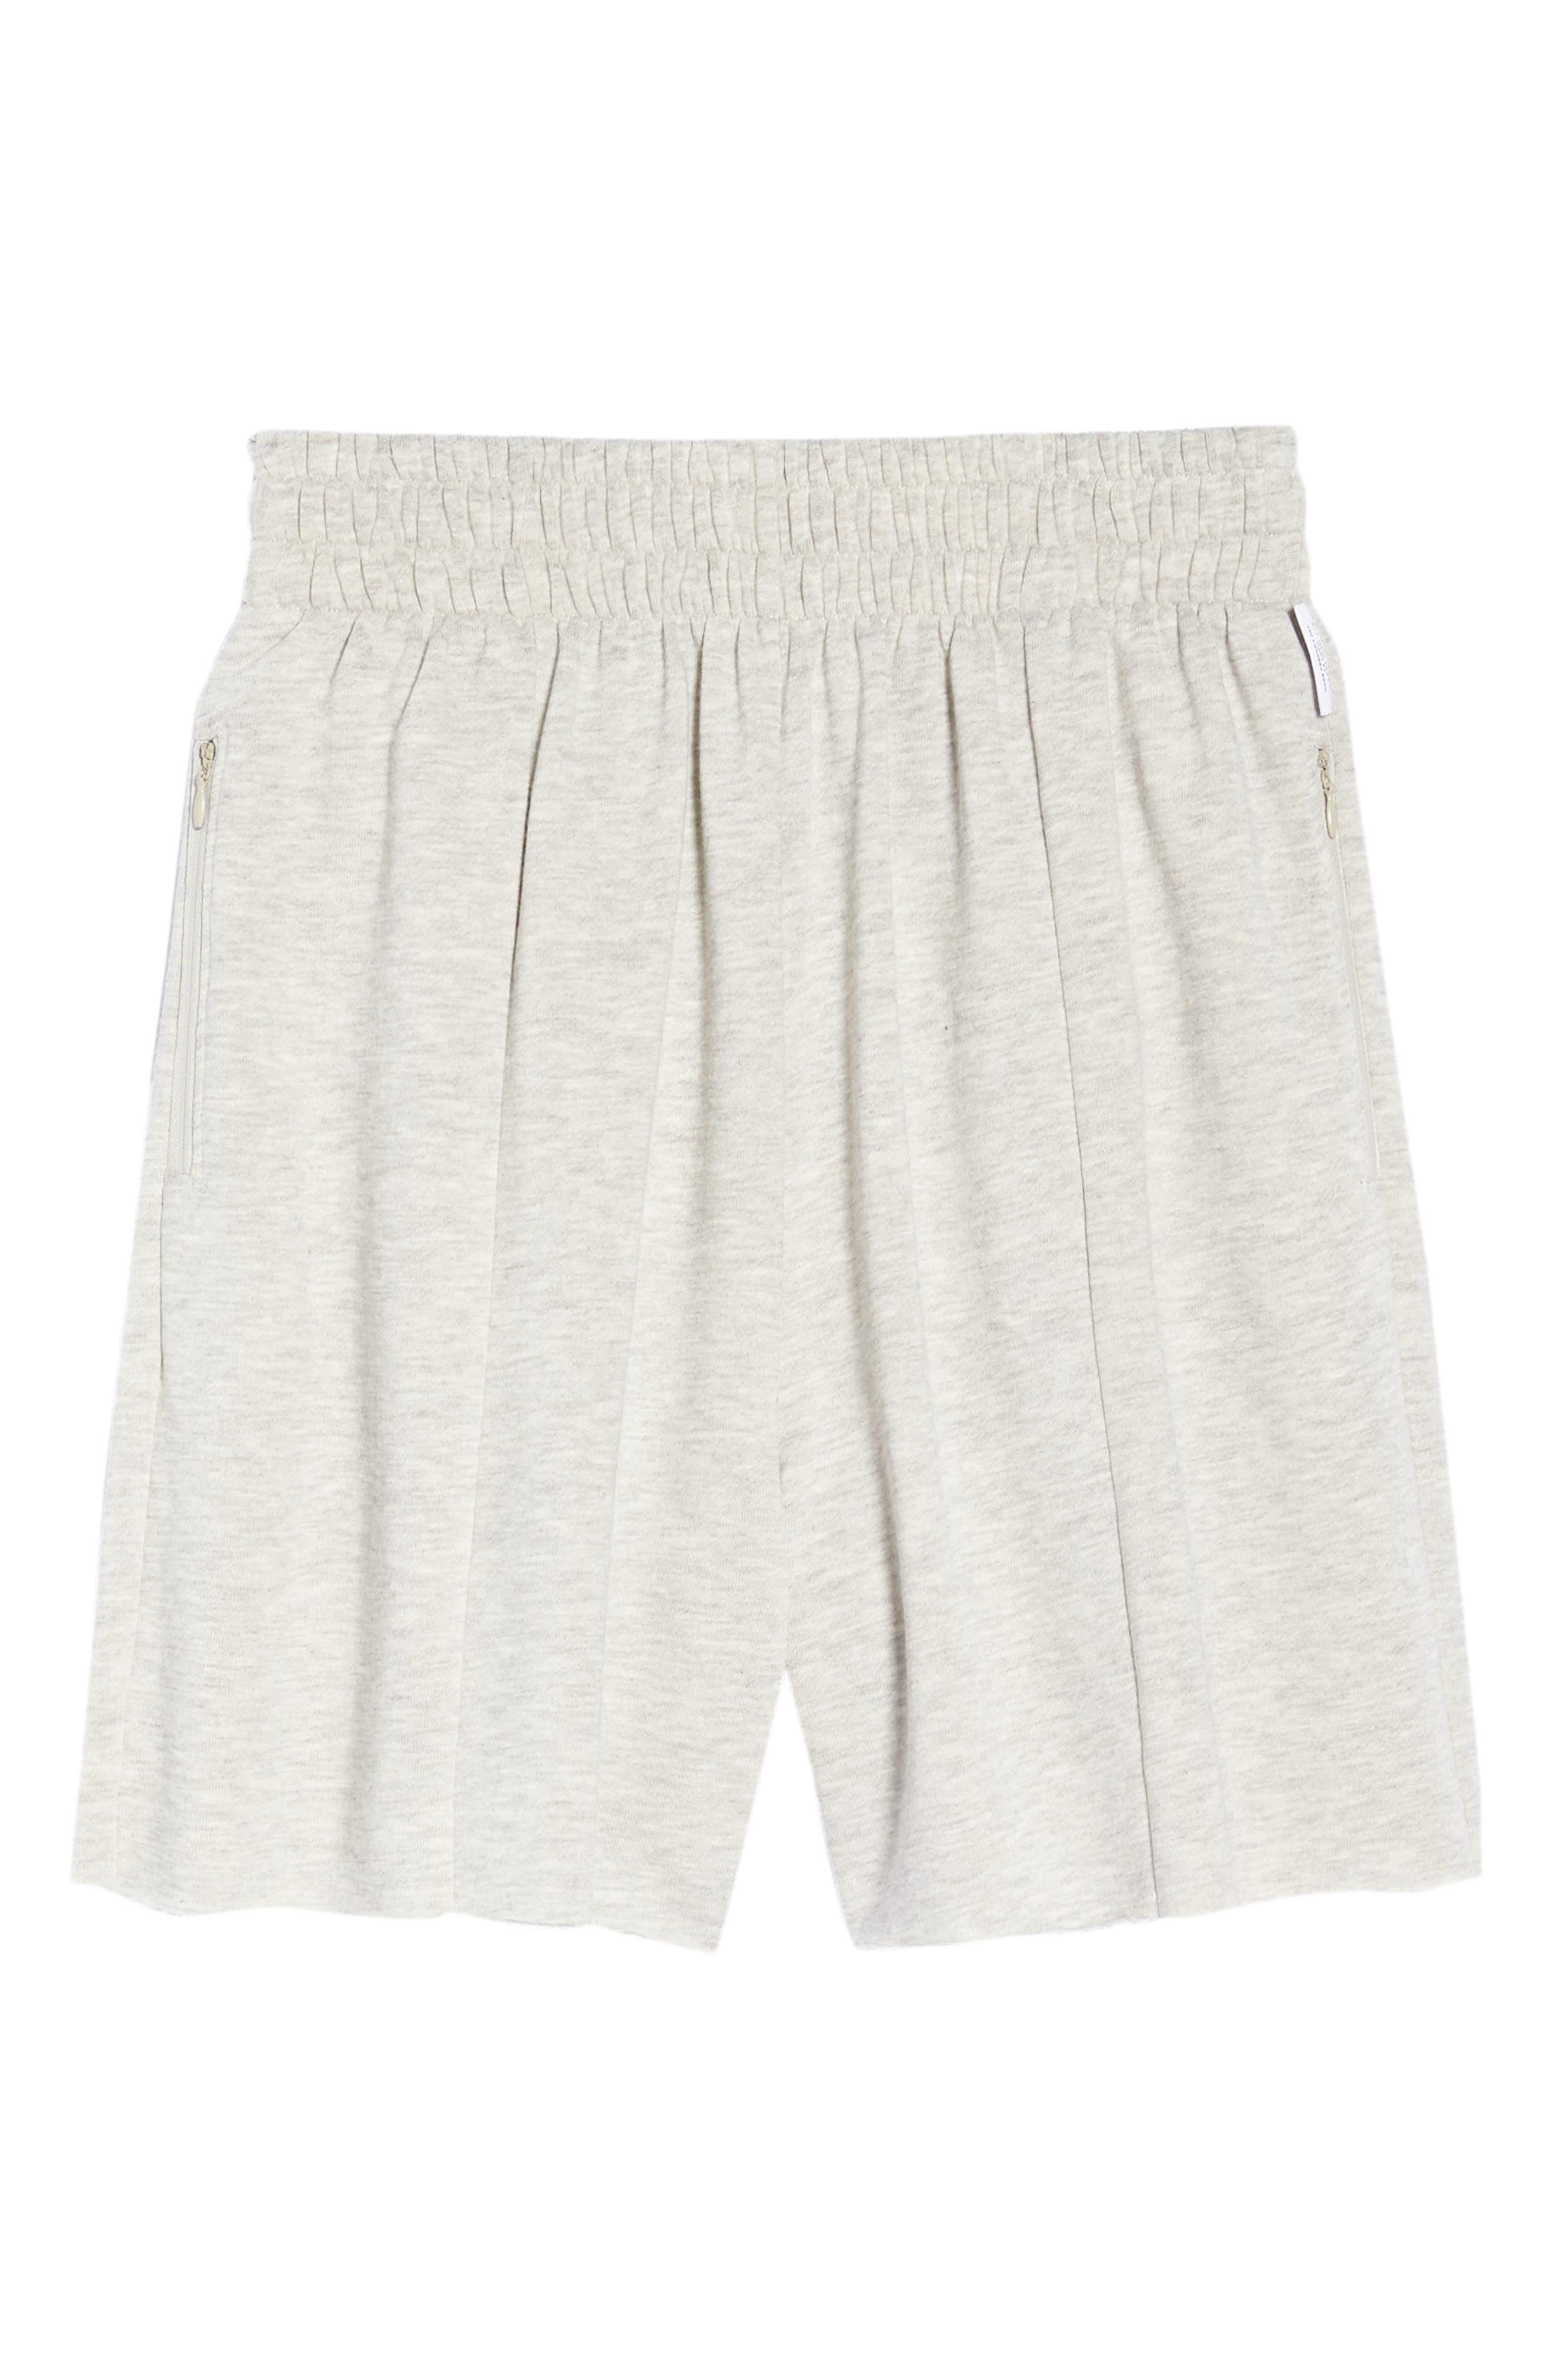 Bermuda Lounge Shorts,                             Alternate thumbnail 6, color,                             PEBBLE HEATHER